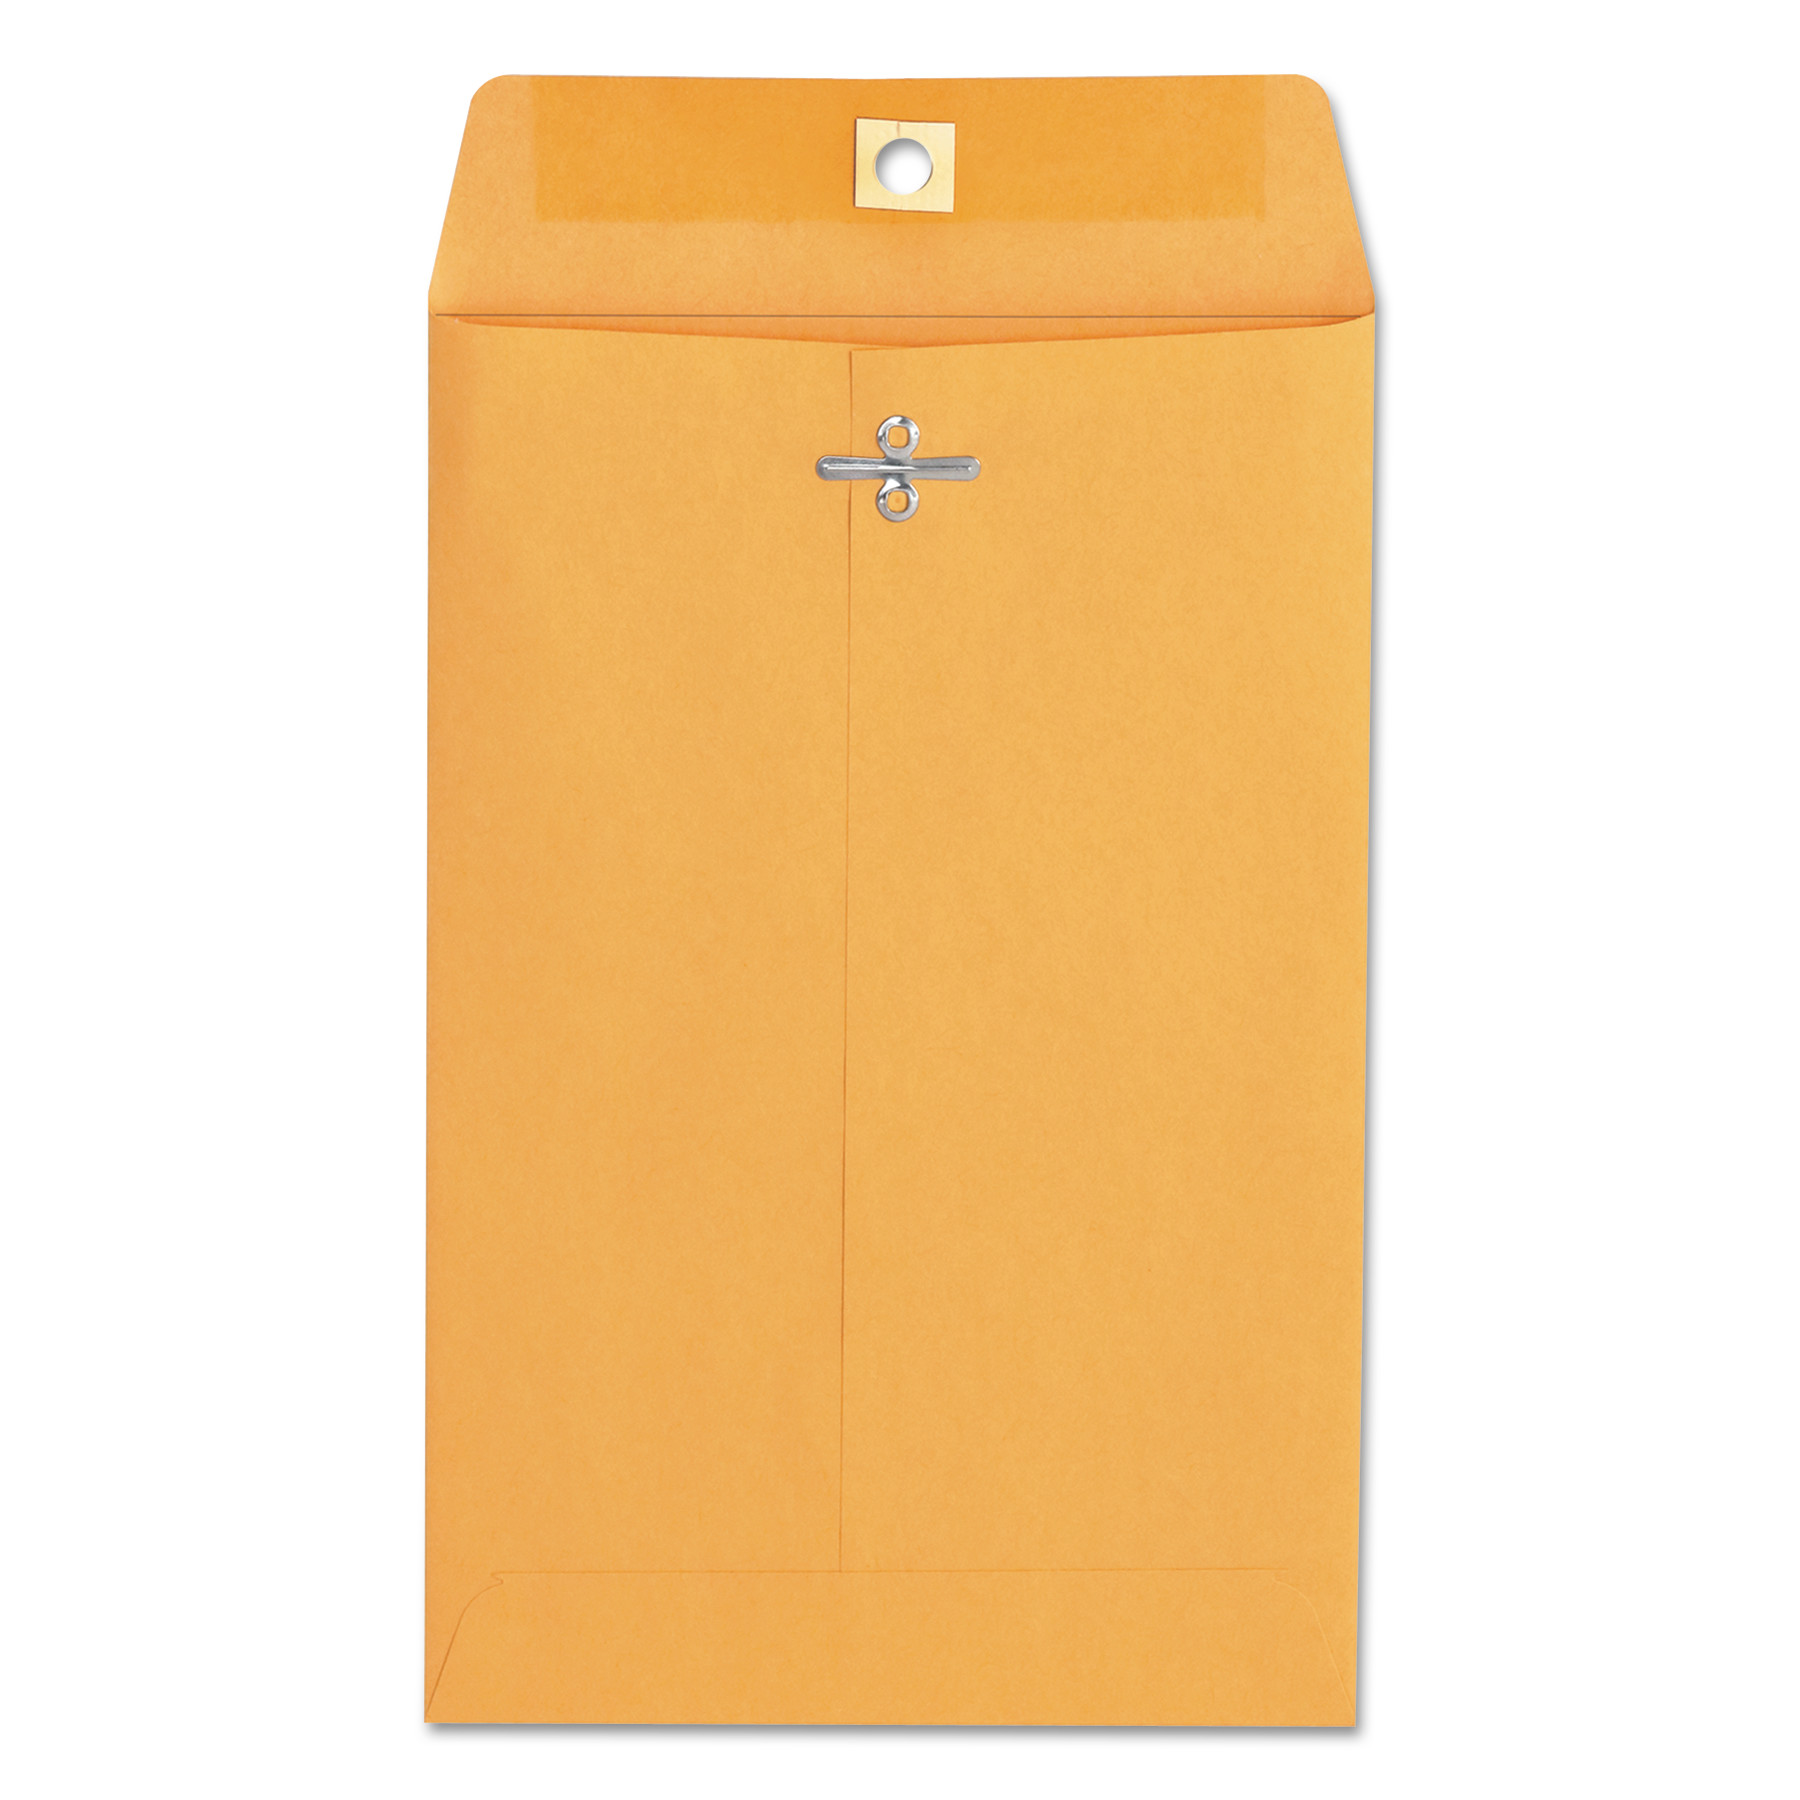 Kraft Clasp Envelope, #55, Square, Clasp/Gummed Closure, 6 x 9, Brown Kraft, 100/Box